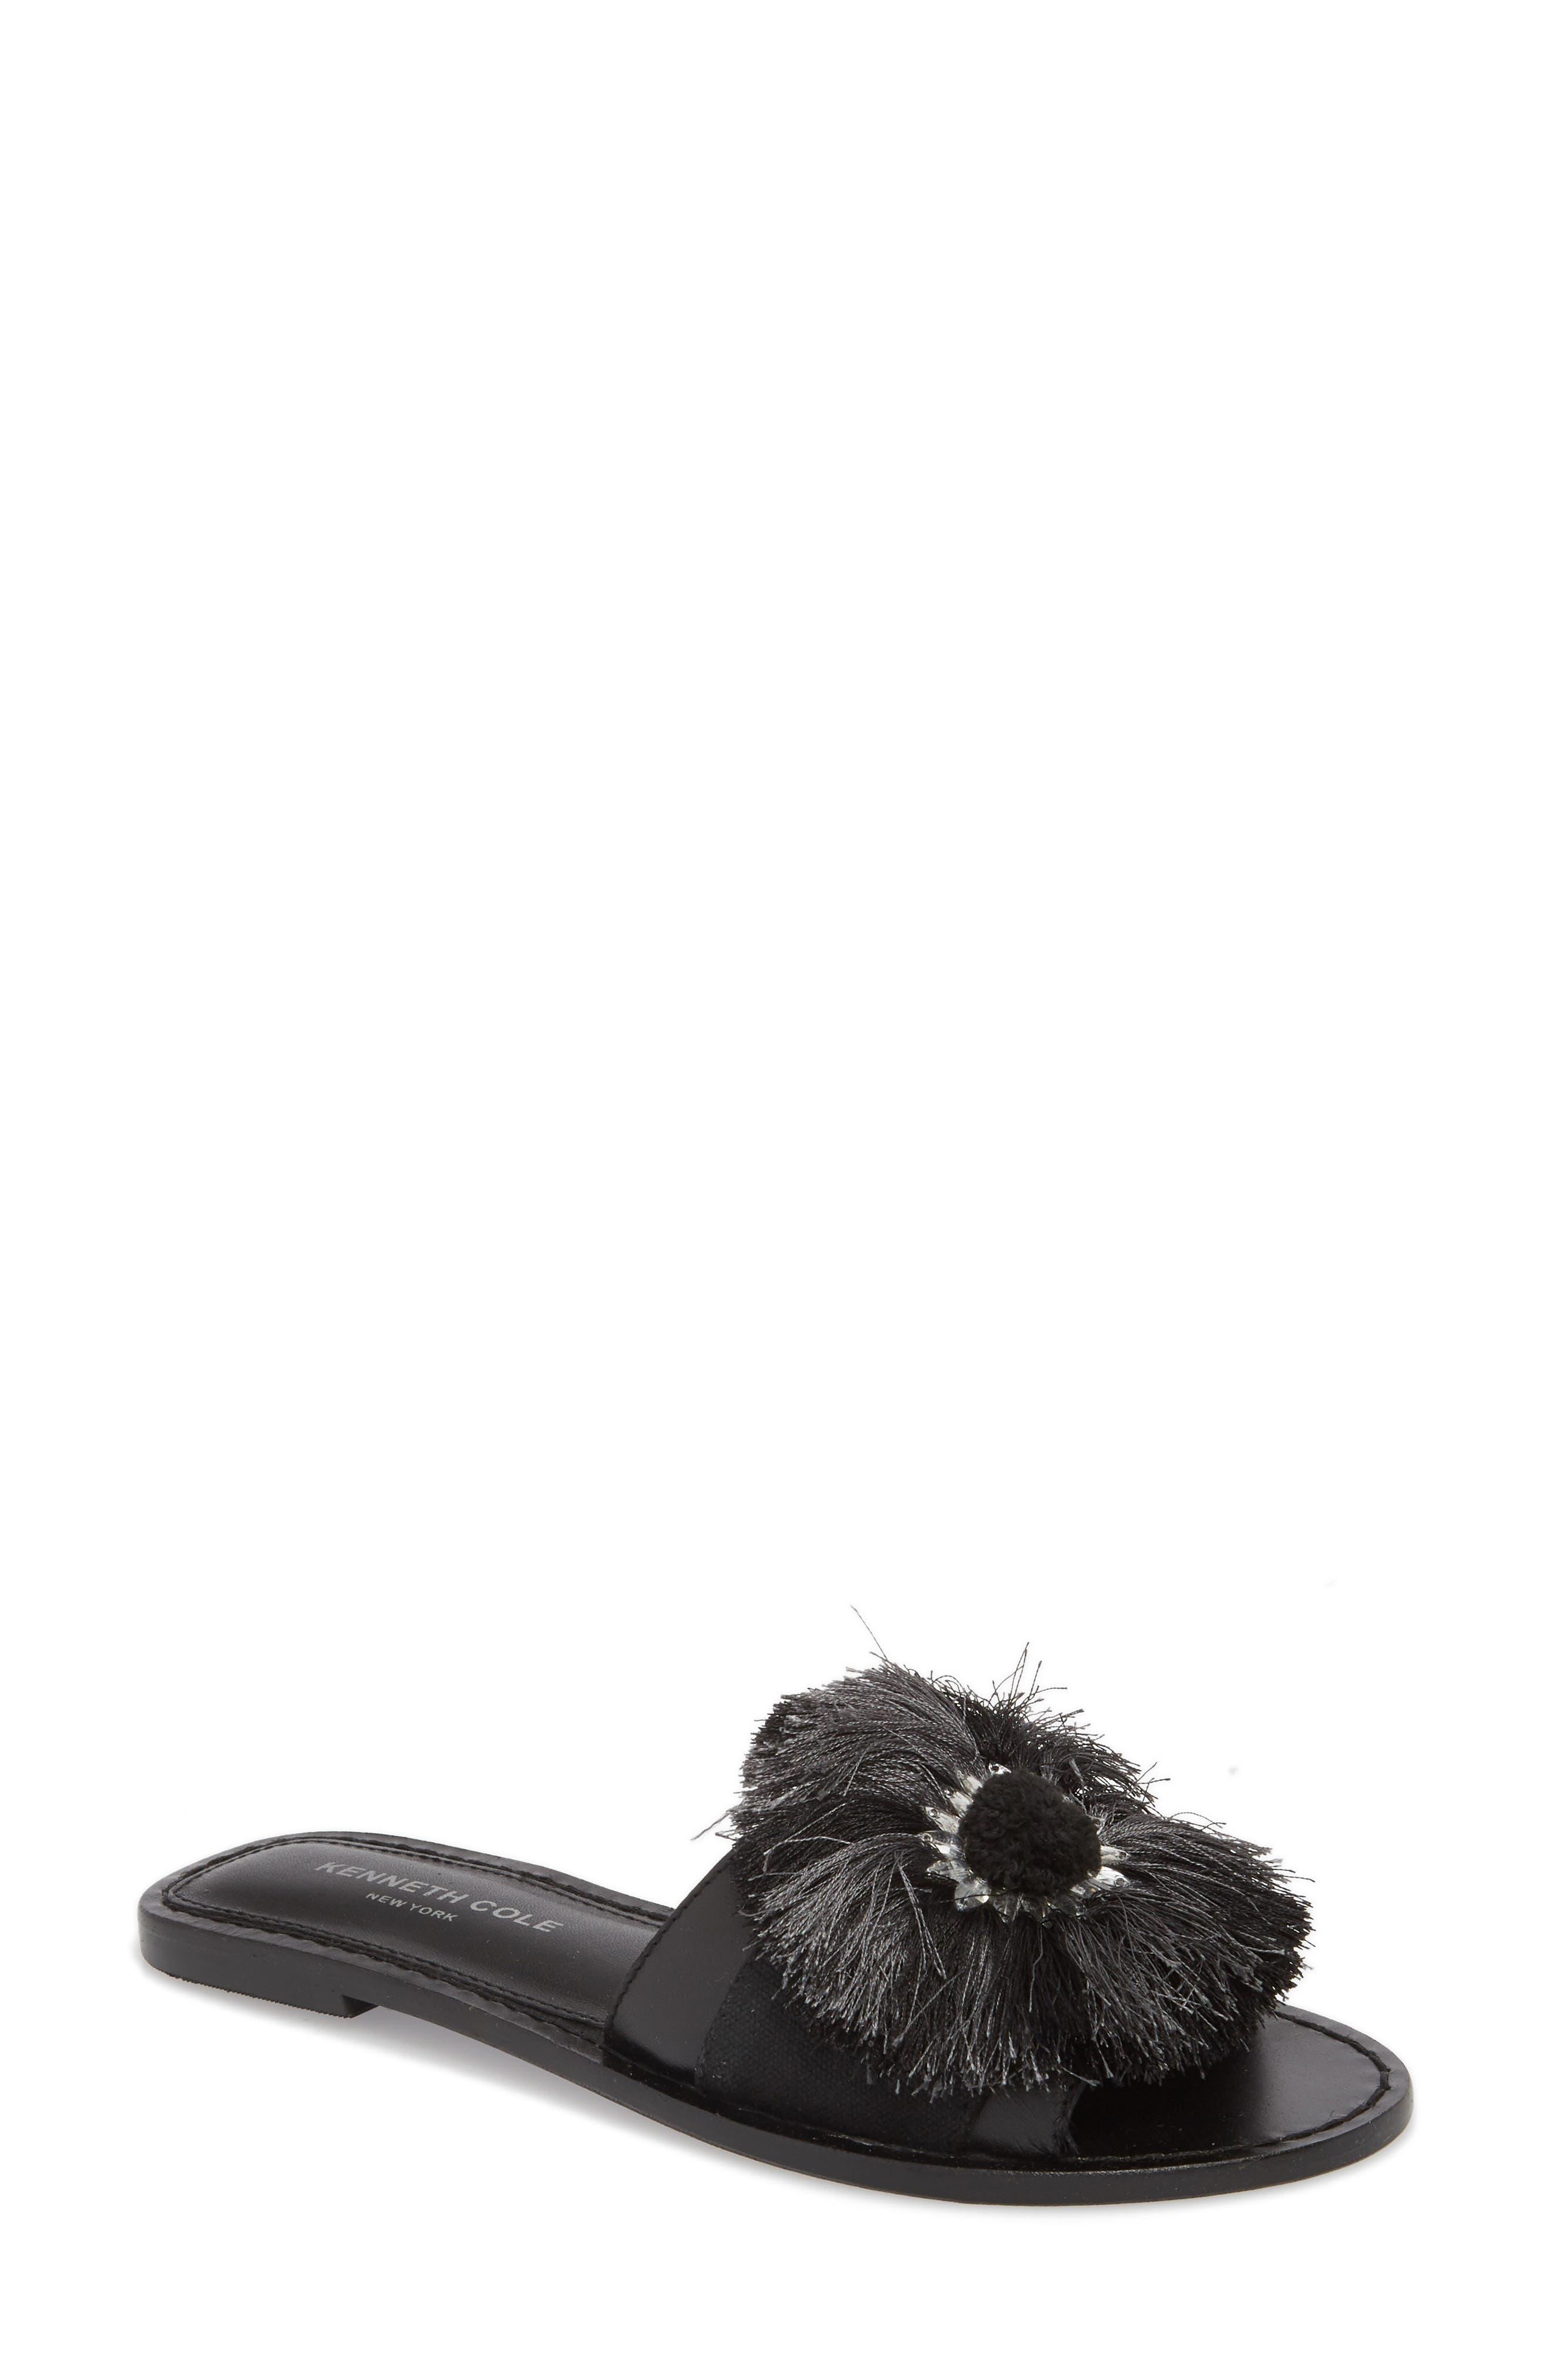 Orton Slide Sandal,                         Main,                         color, 001